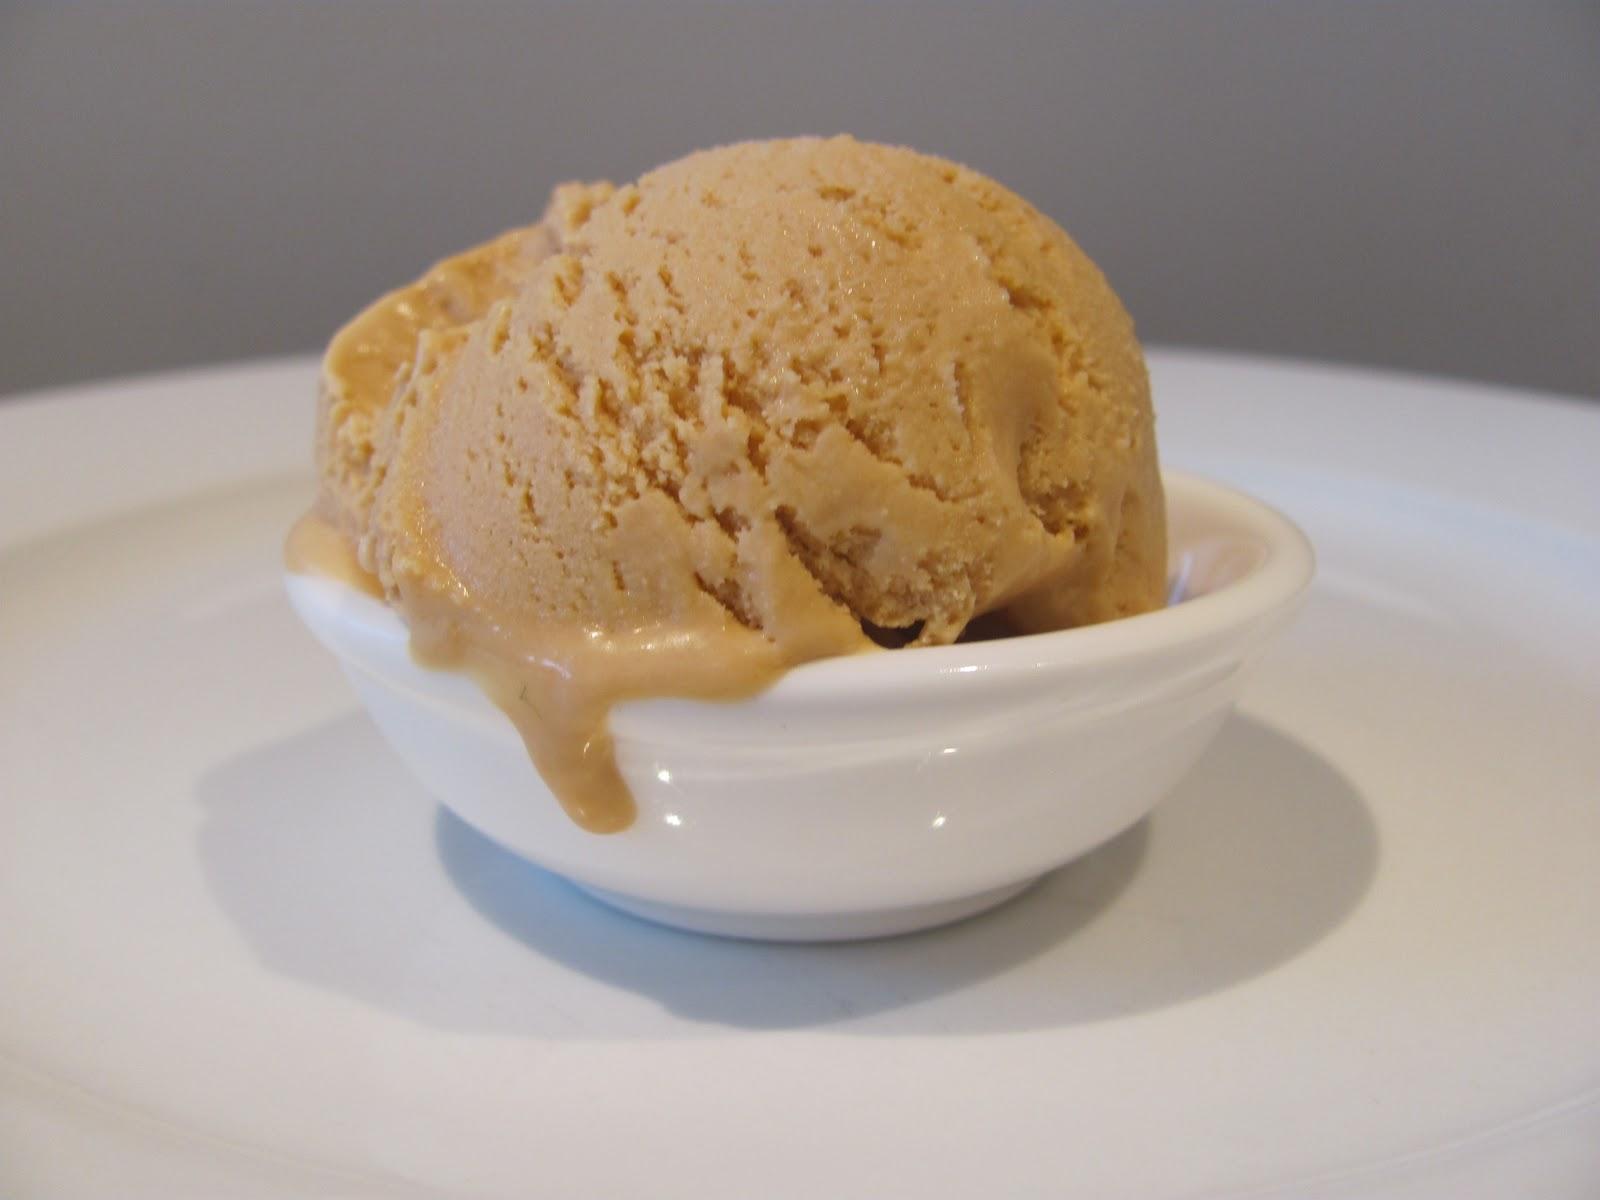 creme fraiche simple creme caramel recipes dishmaps simple creme ...